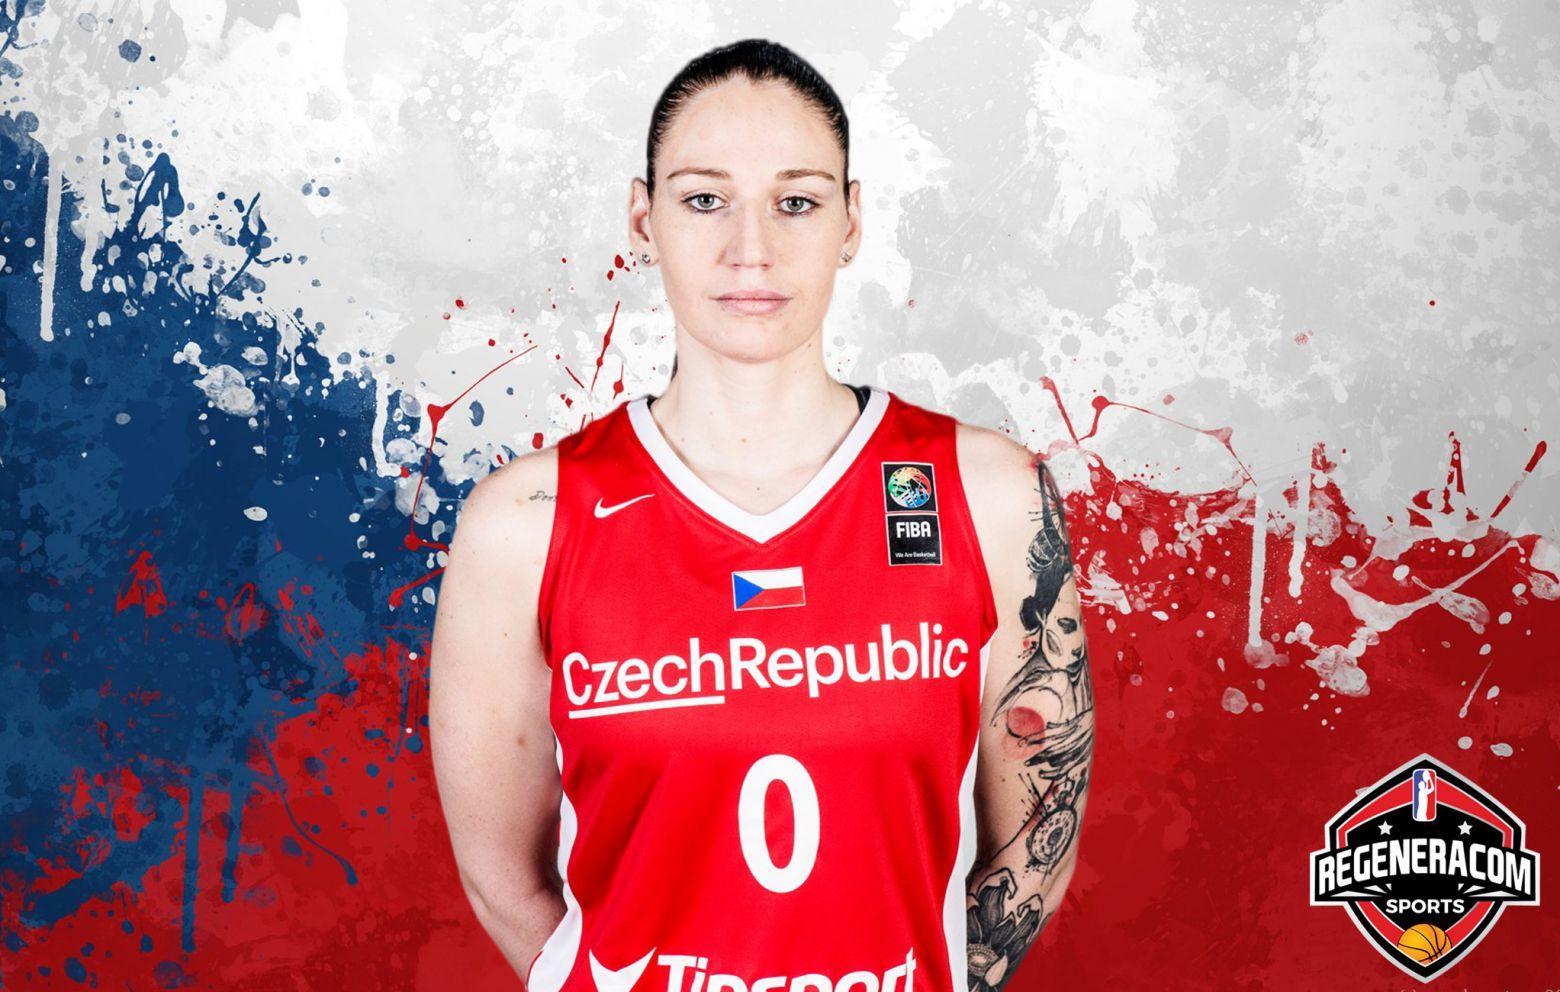 RENATA BREZINOVA has signed in Hungary with Cegled